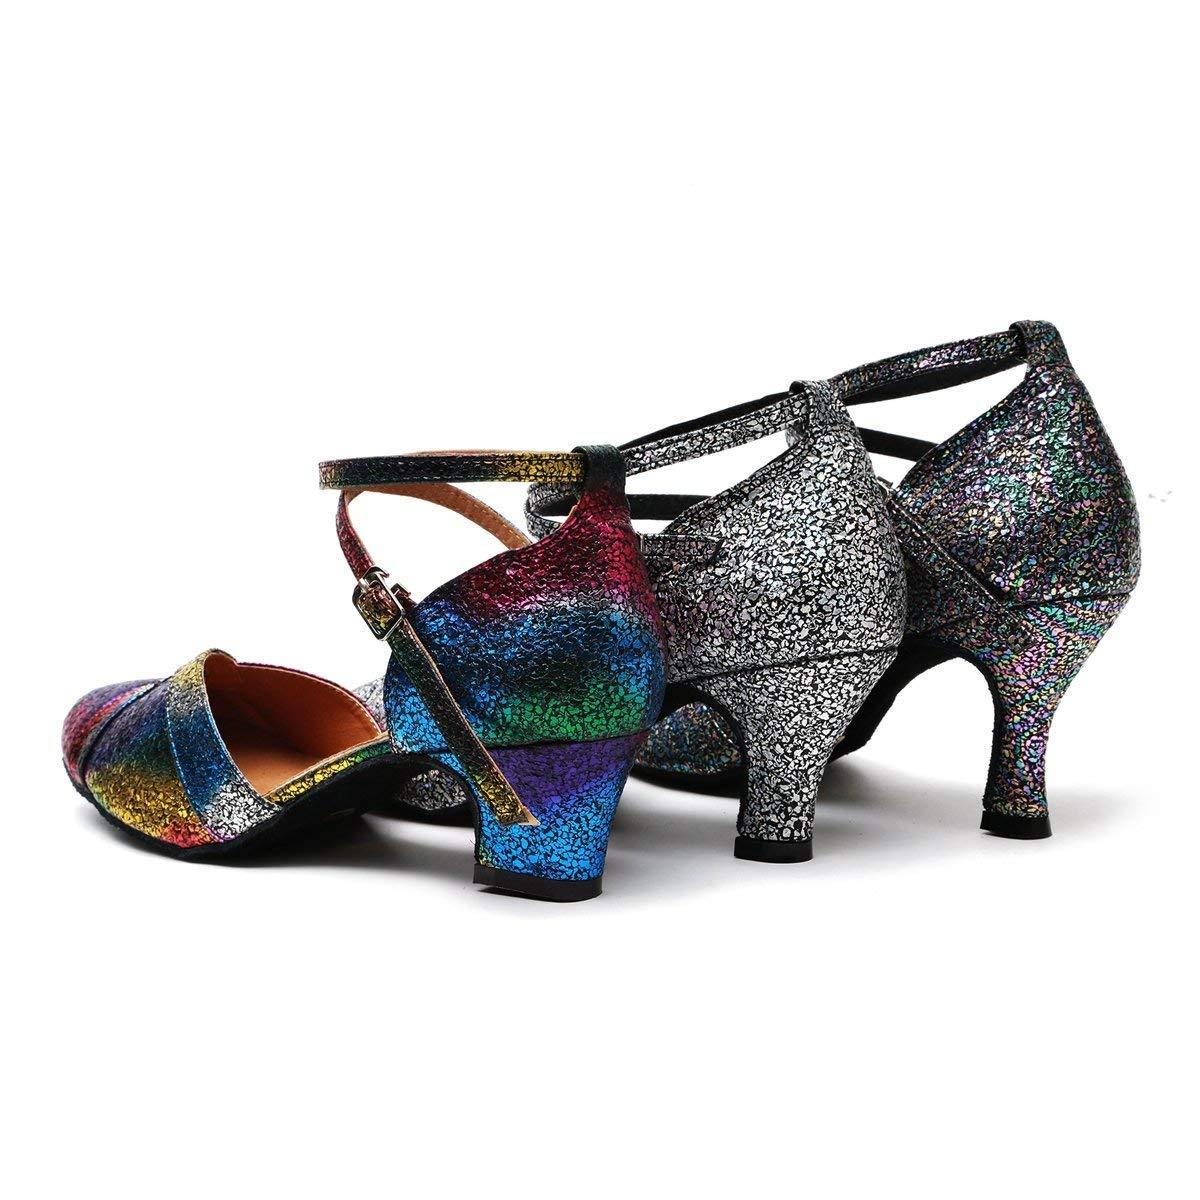 Qiusa Damenmode Knöchelriemen Glitter Latin Salsa Tanzschuhe Formale Formale Formale Hochzeit Pumps (Farbe   MultiFarbe Silber-7.5cm Heel Größe   2 UK) 171b08